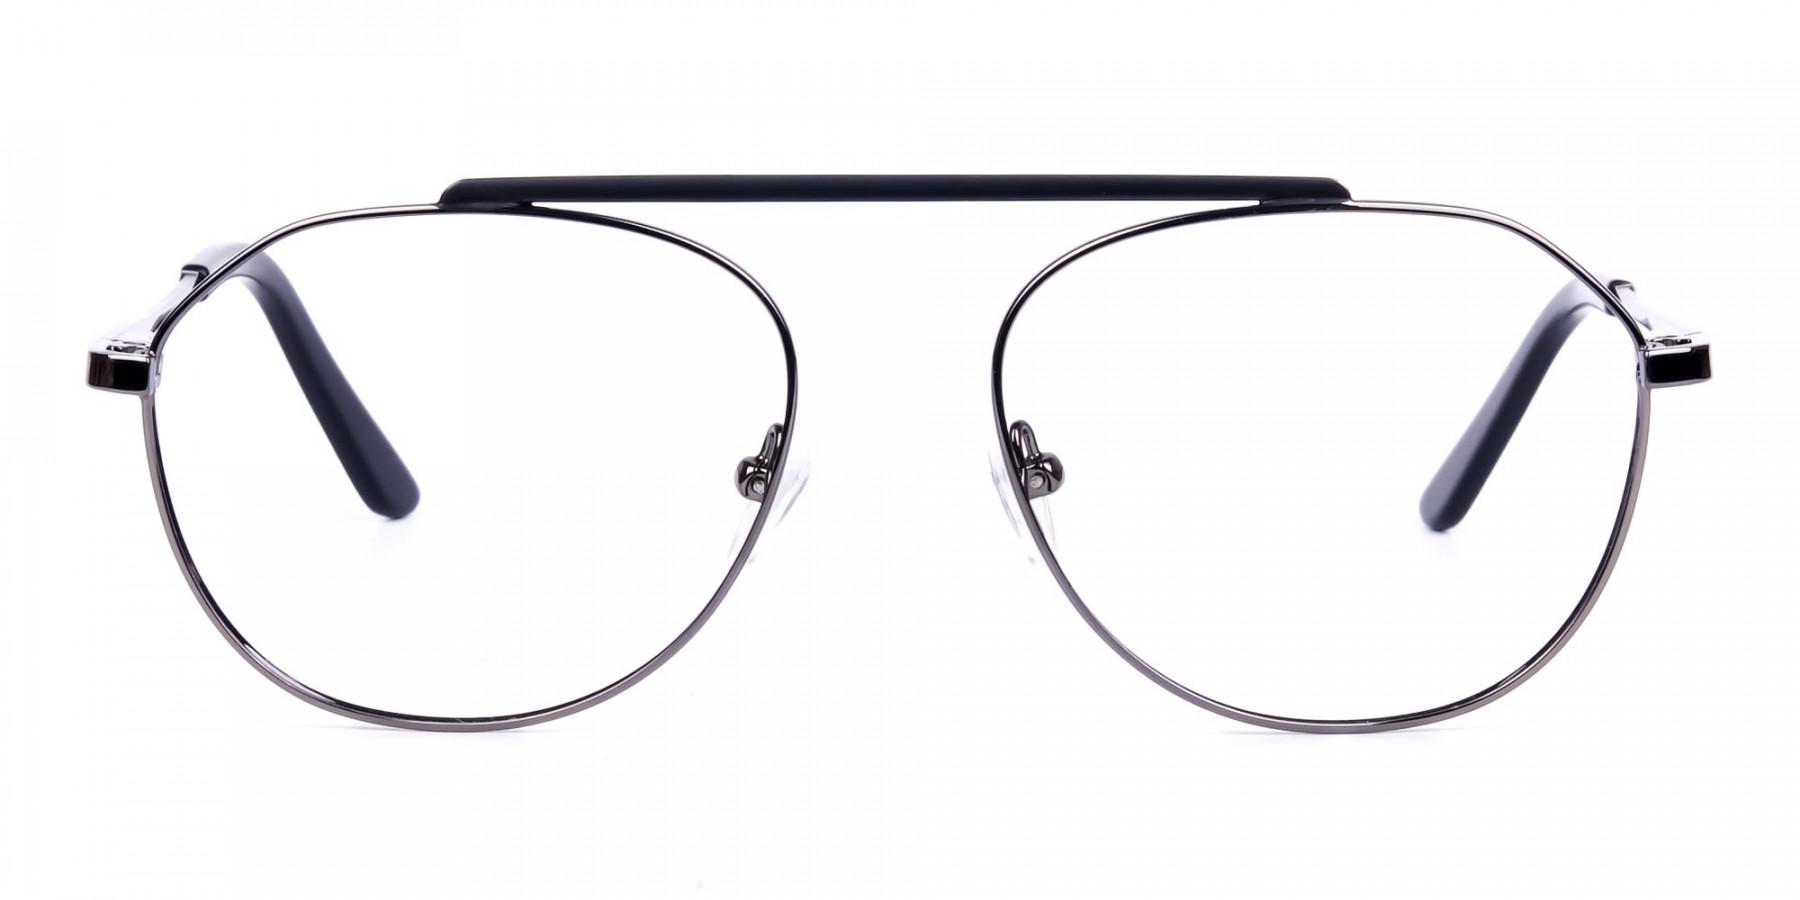 Classic-Black-Gunmetal-Aviator-Glasses-1